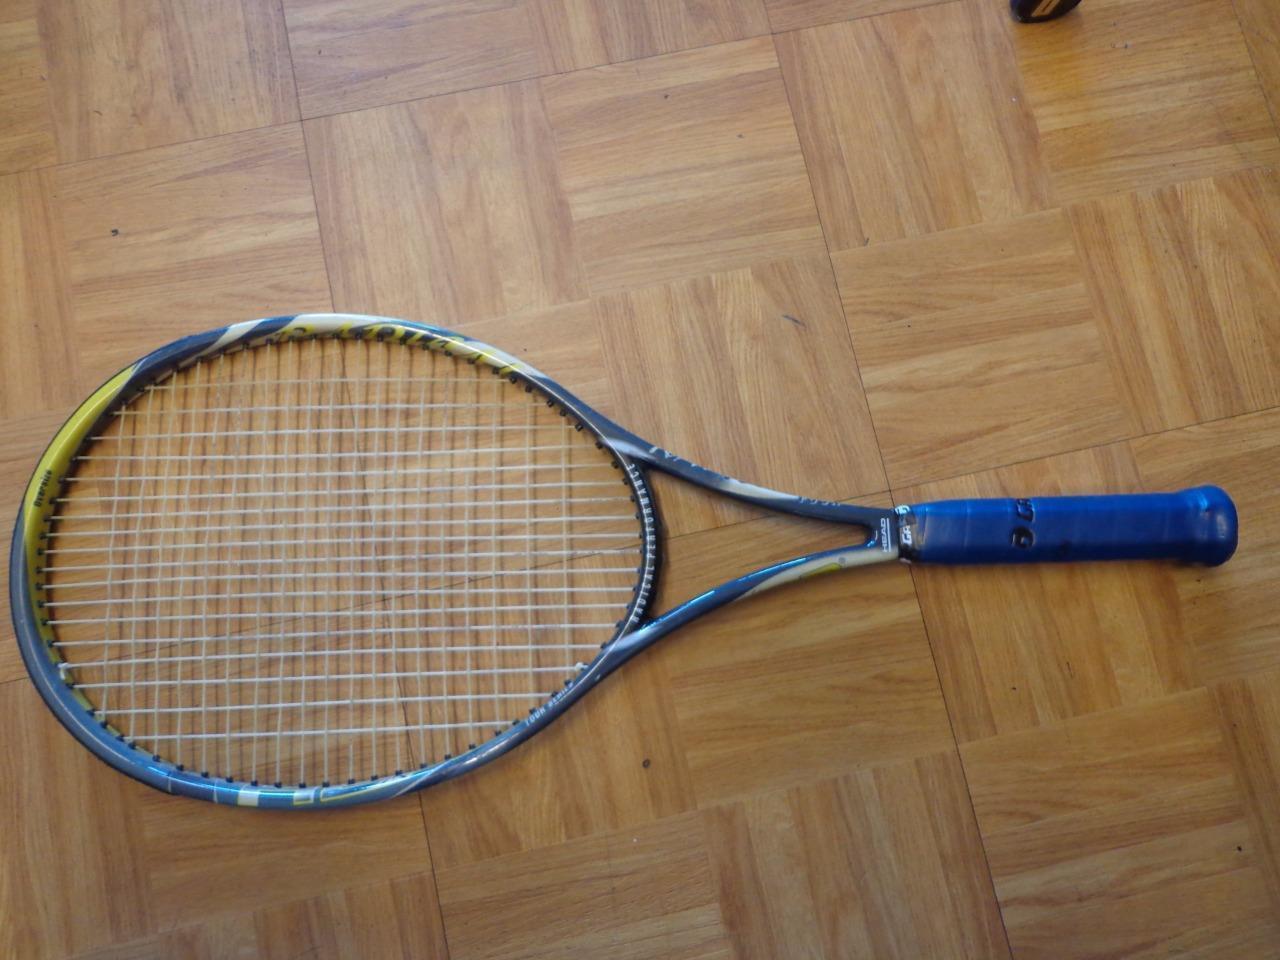 Head Radical Tour Zebra 107 Agassi Made in Austria 4 1 4 grip raquette de tennis